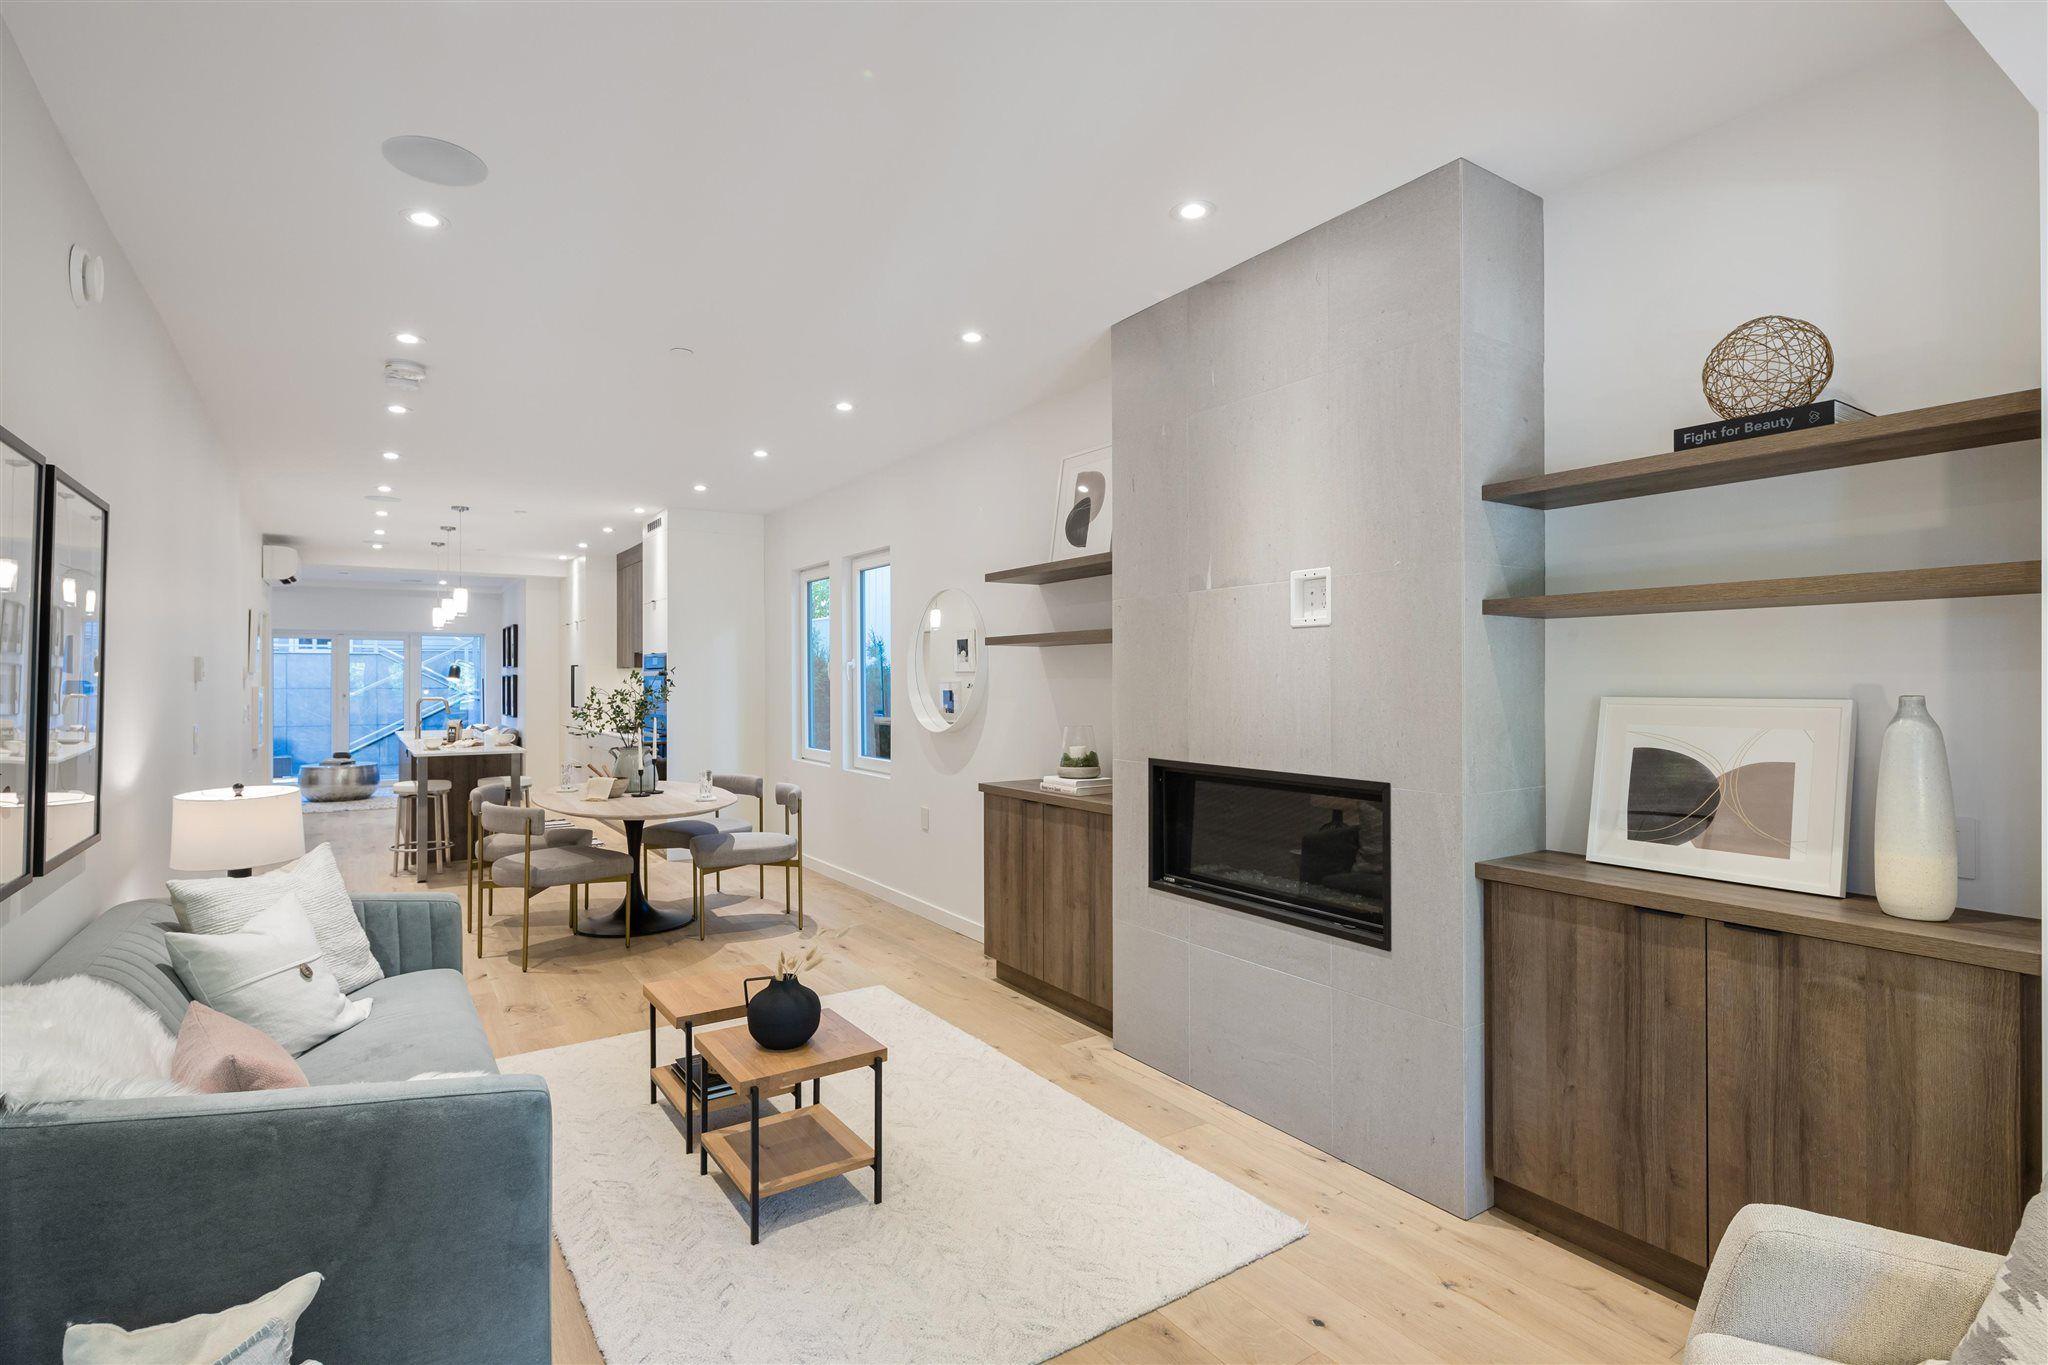 Main Photo: 2146 W 1ST Avenue in Vancouver: Kitsilano 1/2 Duplex for sale (Vancouver West)  : MLS®# R2606015